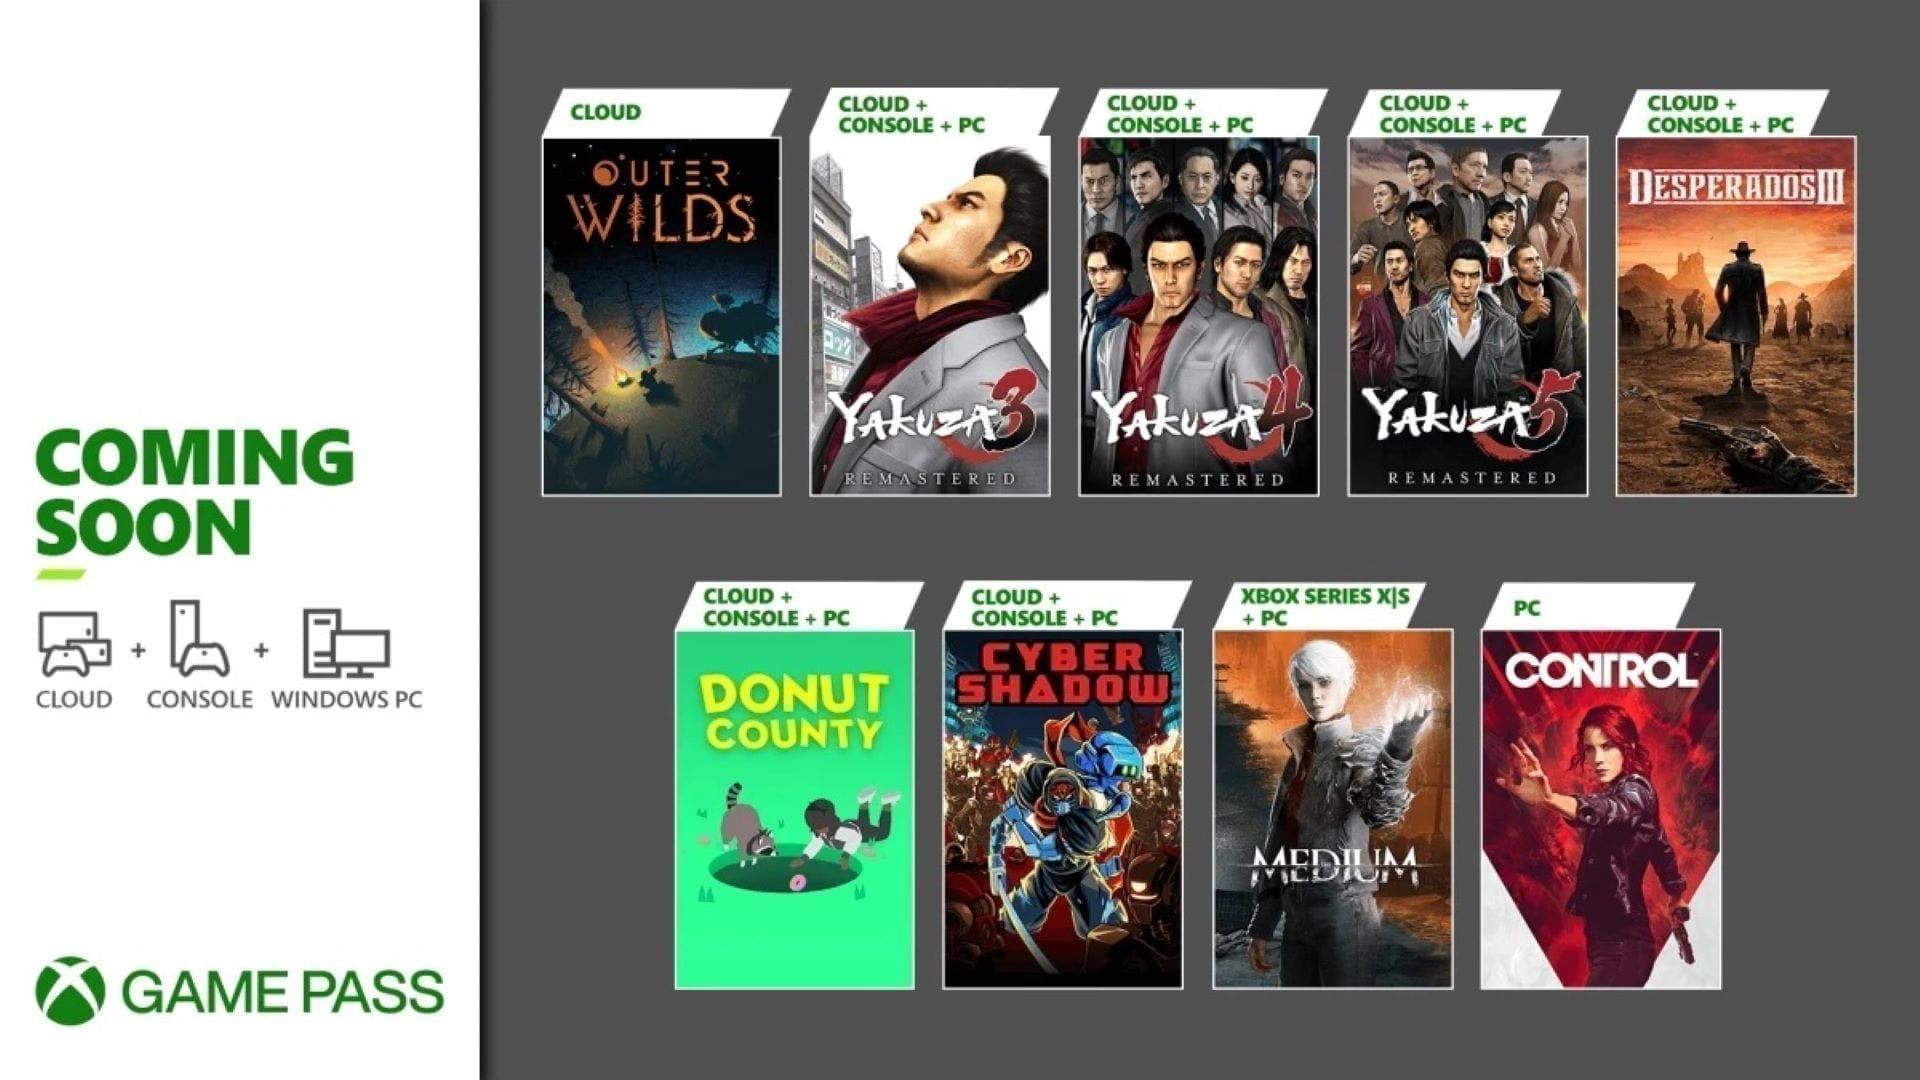 Xbox Game Pass weitere Highlights im Januar 2021